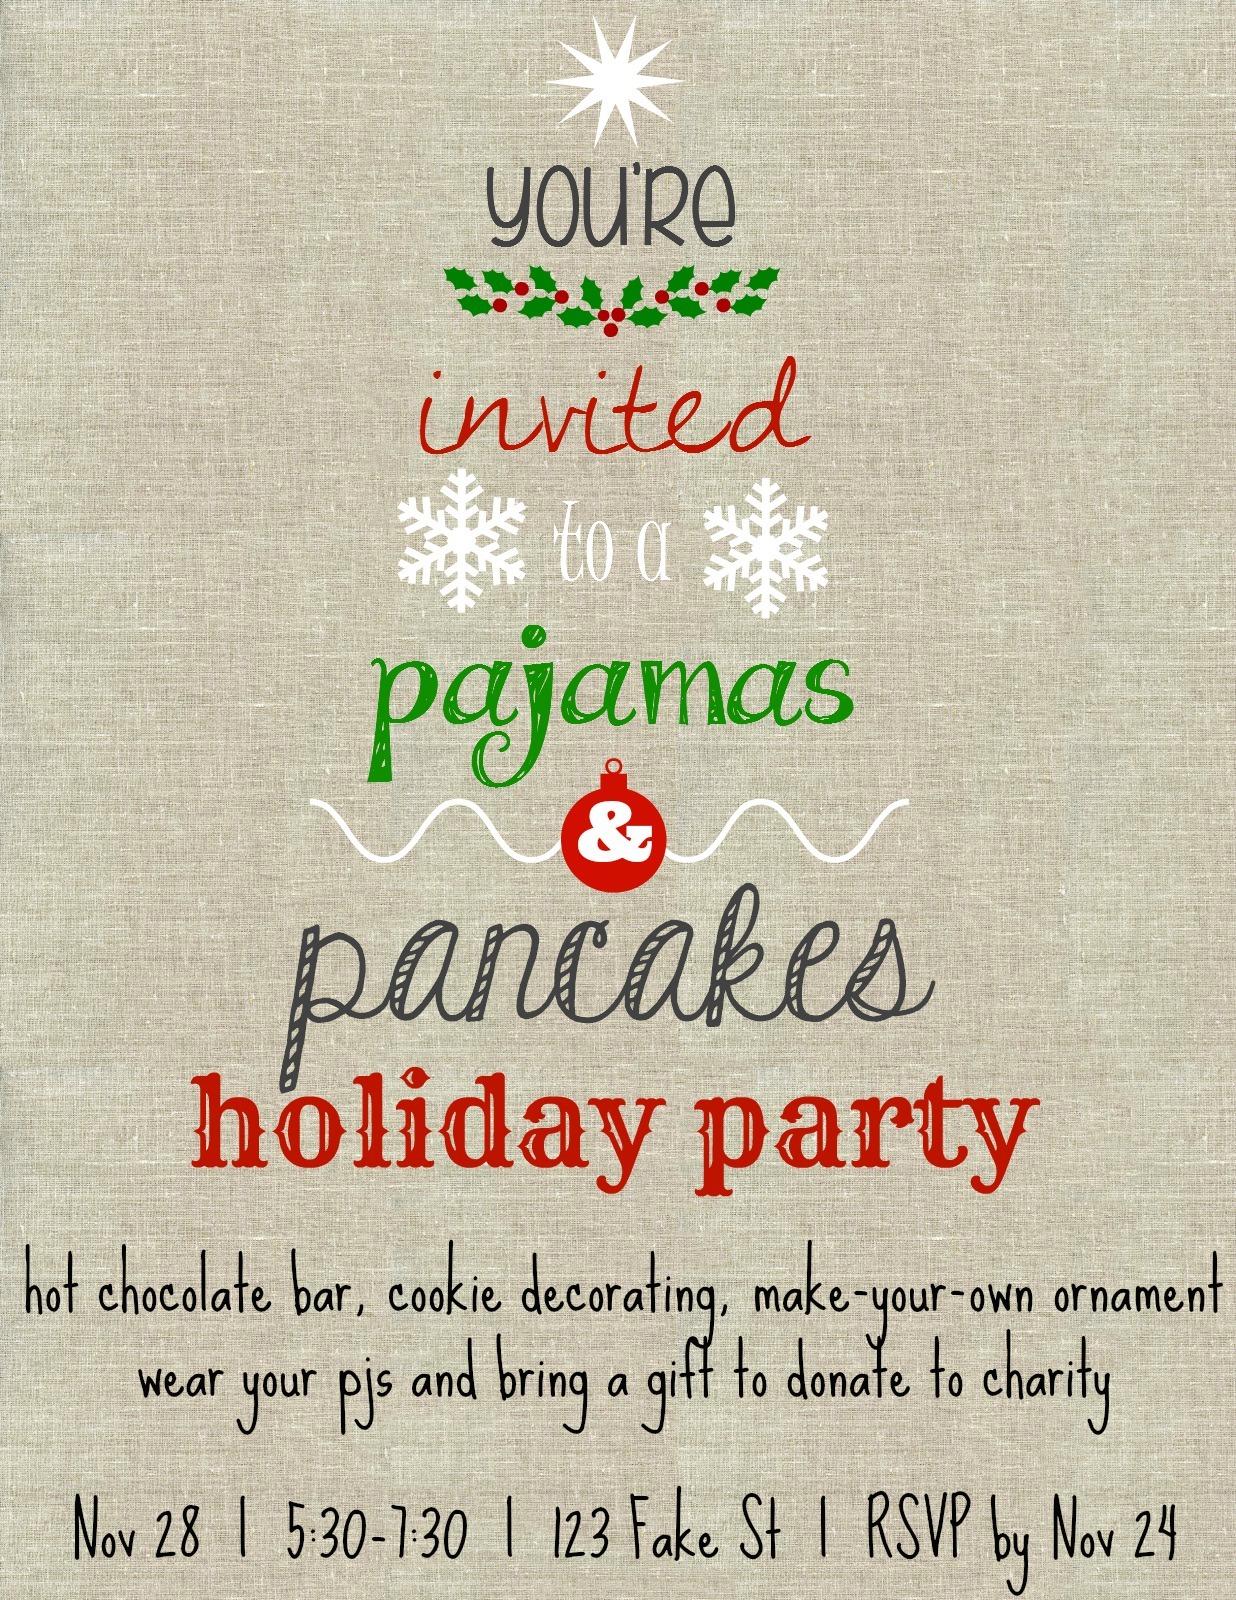 Holiday Pajamas & Pancakes Family Party | The ELM Life